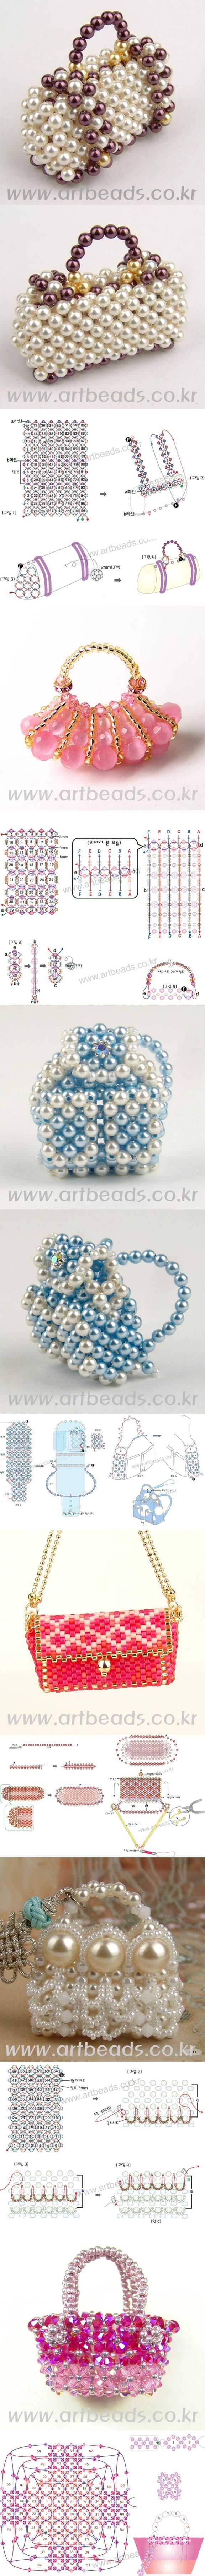 DIY Cute Miniature Beaded Handbags | iCreativeIdeas.com LIKE Us on Facebook ==> https://www.facebook.com/icreativeideas